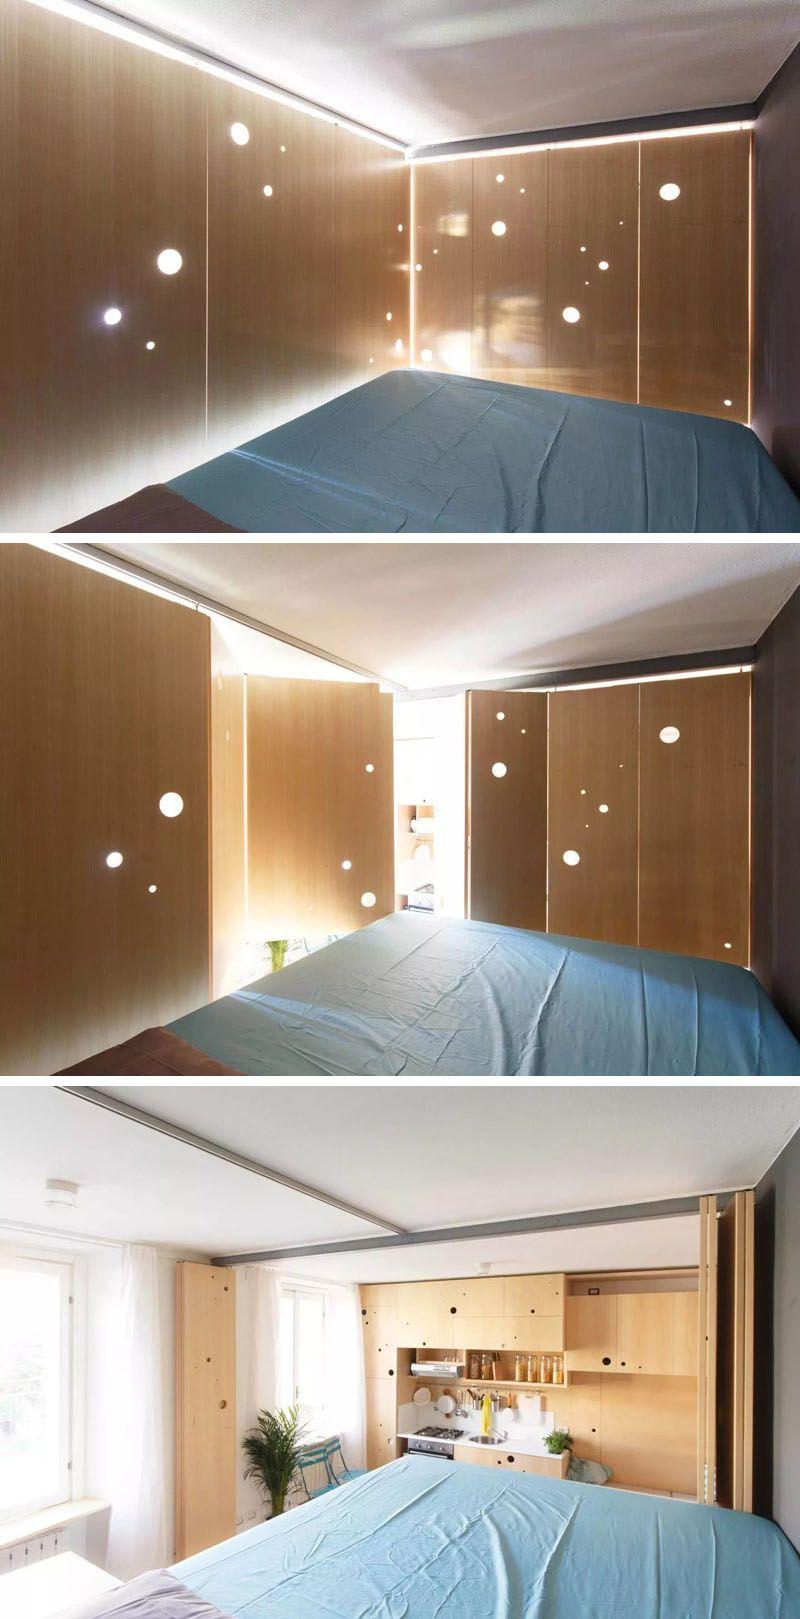 Living Big In A 30 Sqm Apartment A Creative Design Approach Small Apartments Tiny Apartments Tiny Apartment